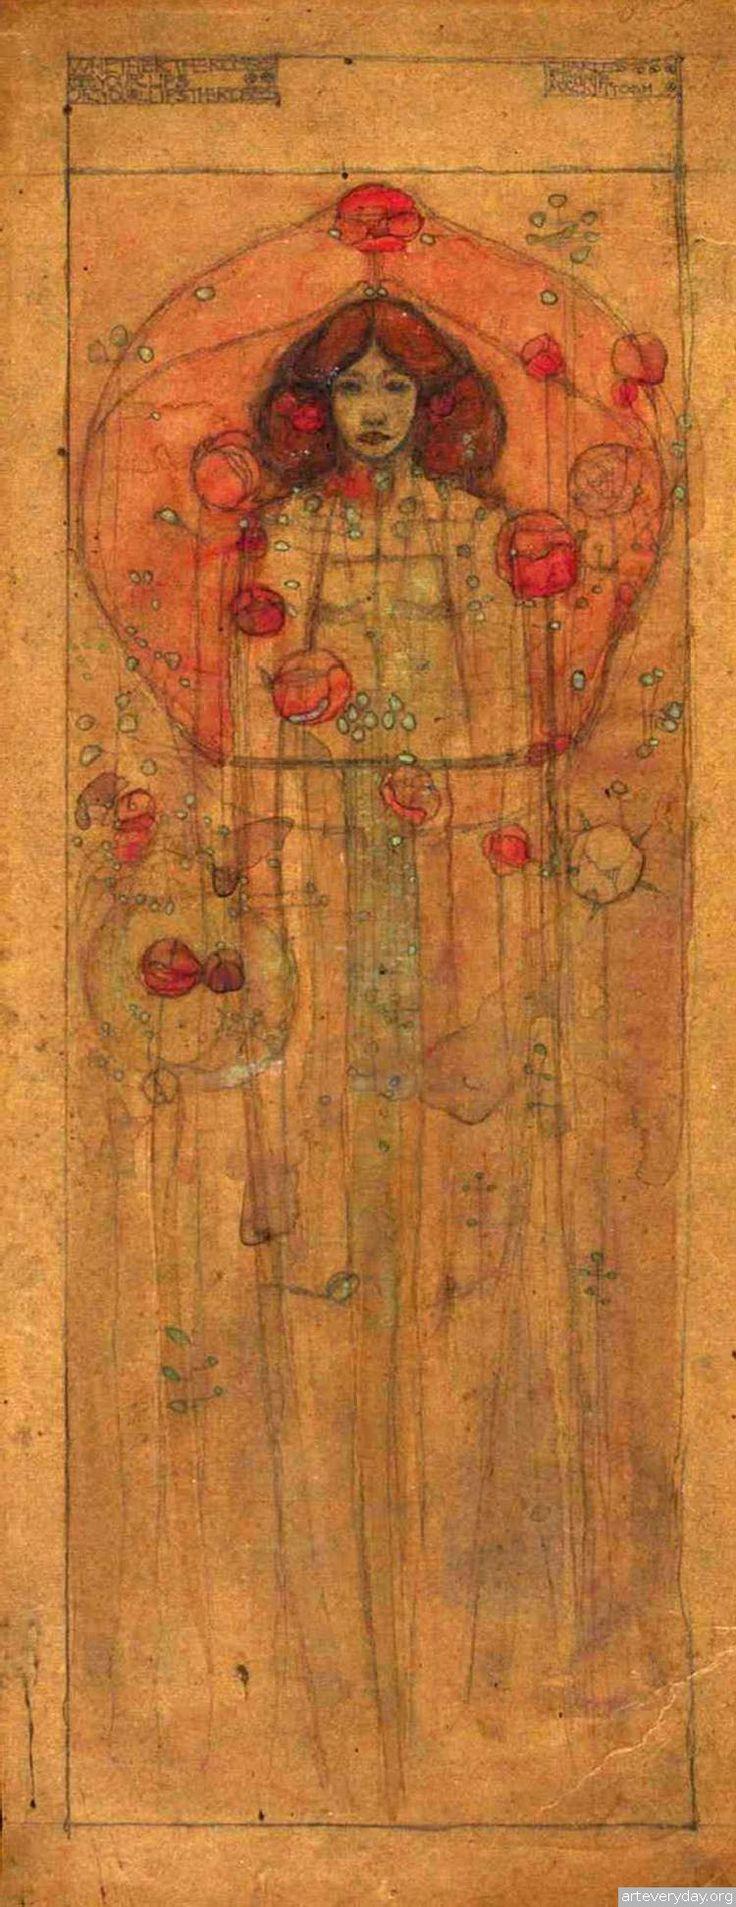 1  Чарльз Ренни Макинтош-Charles Rennie Mackintosh   ARTeveryday.org